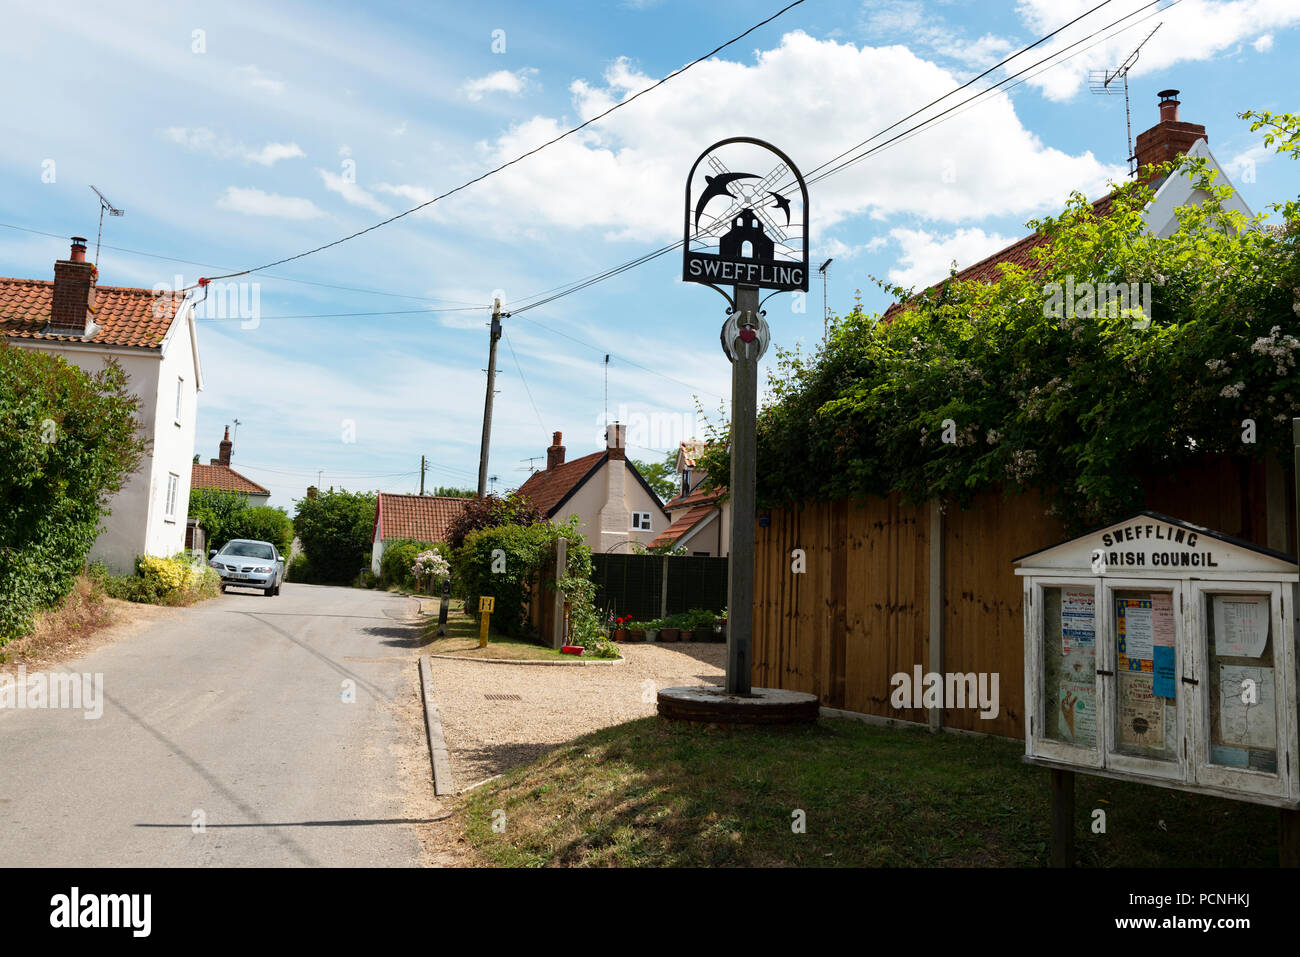 Sweffling Suffolk England - Stock Image